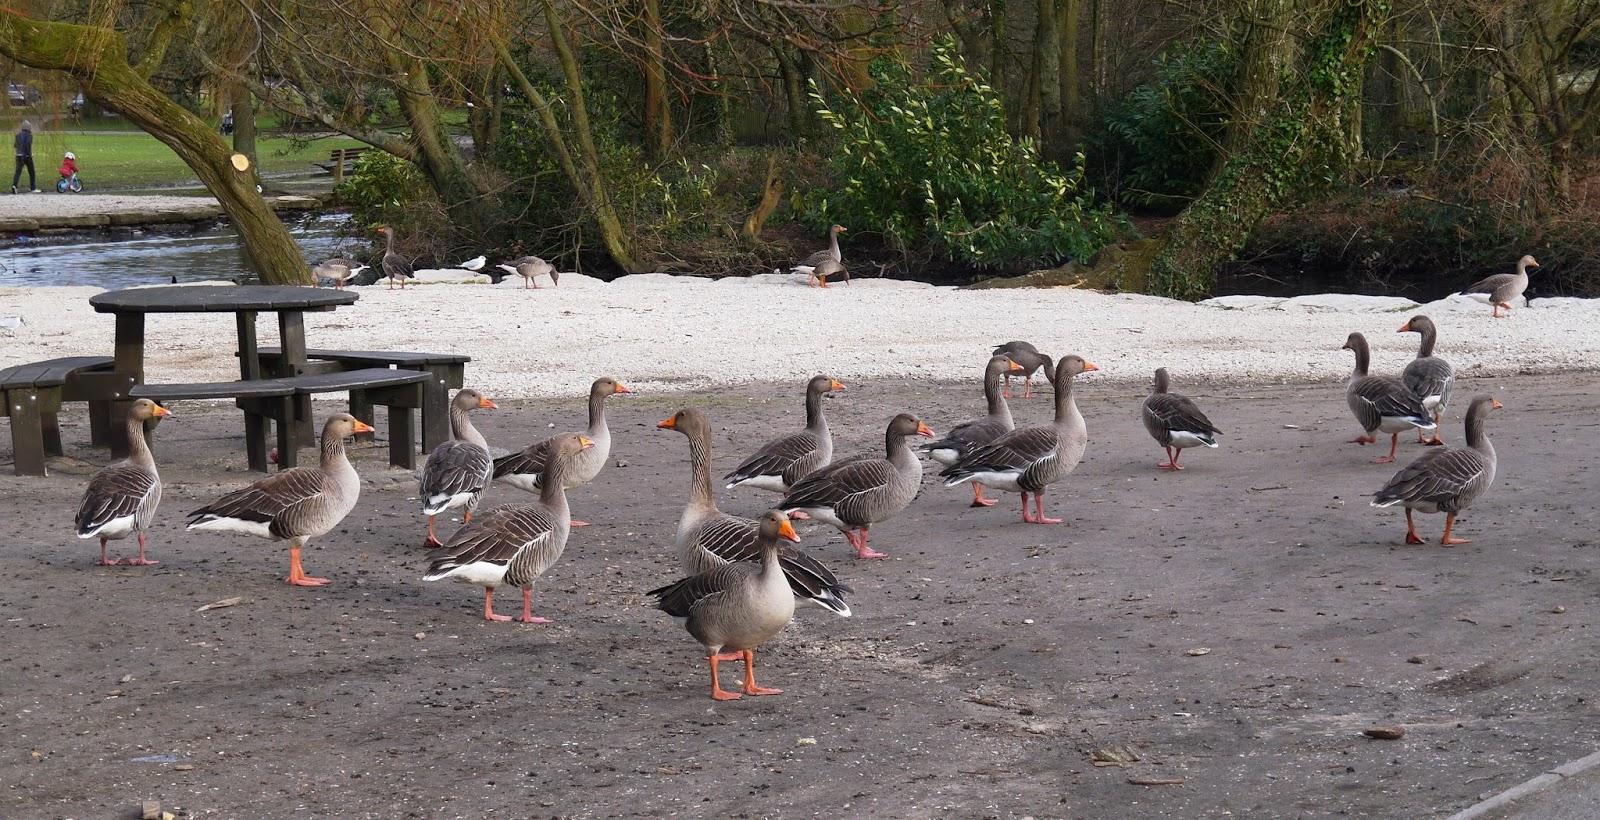 Poole Park ducks